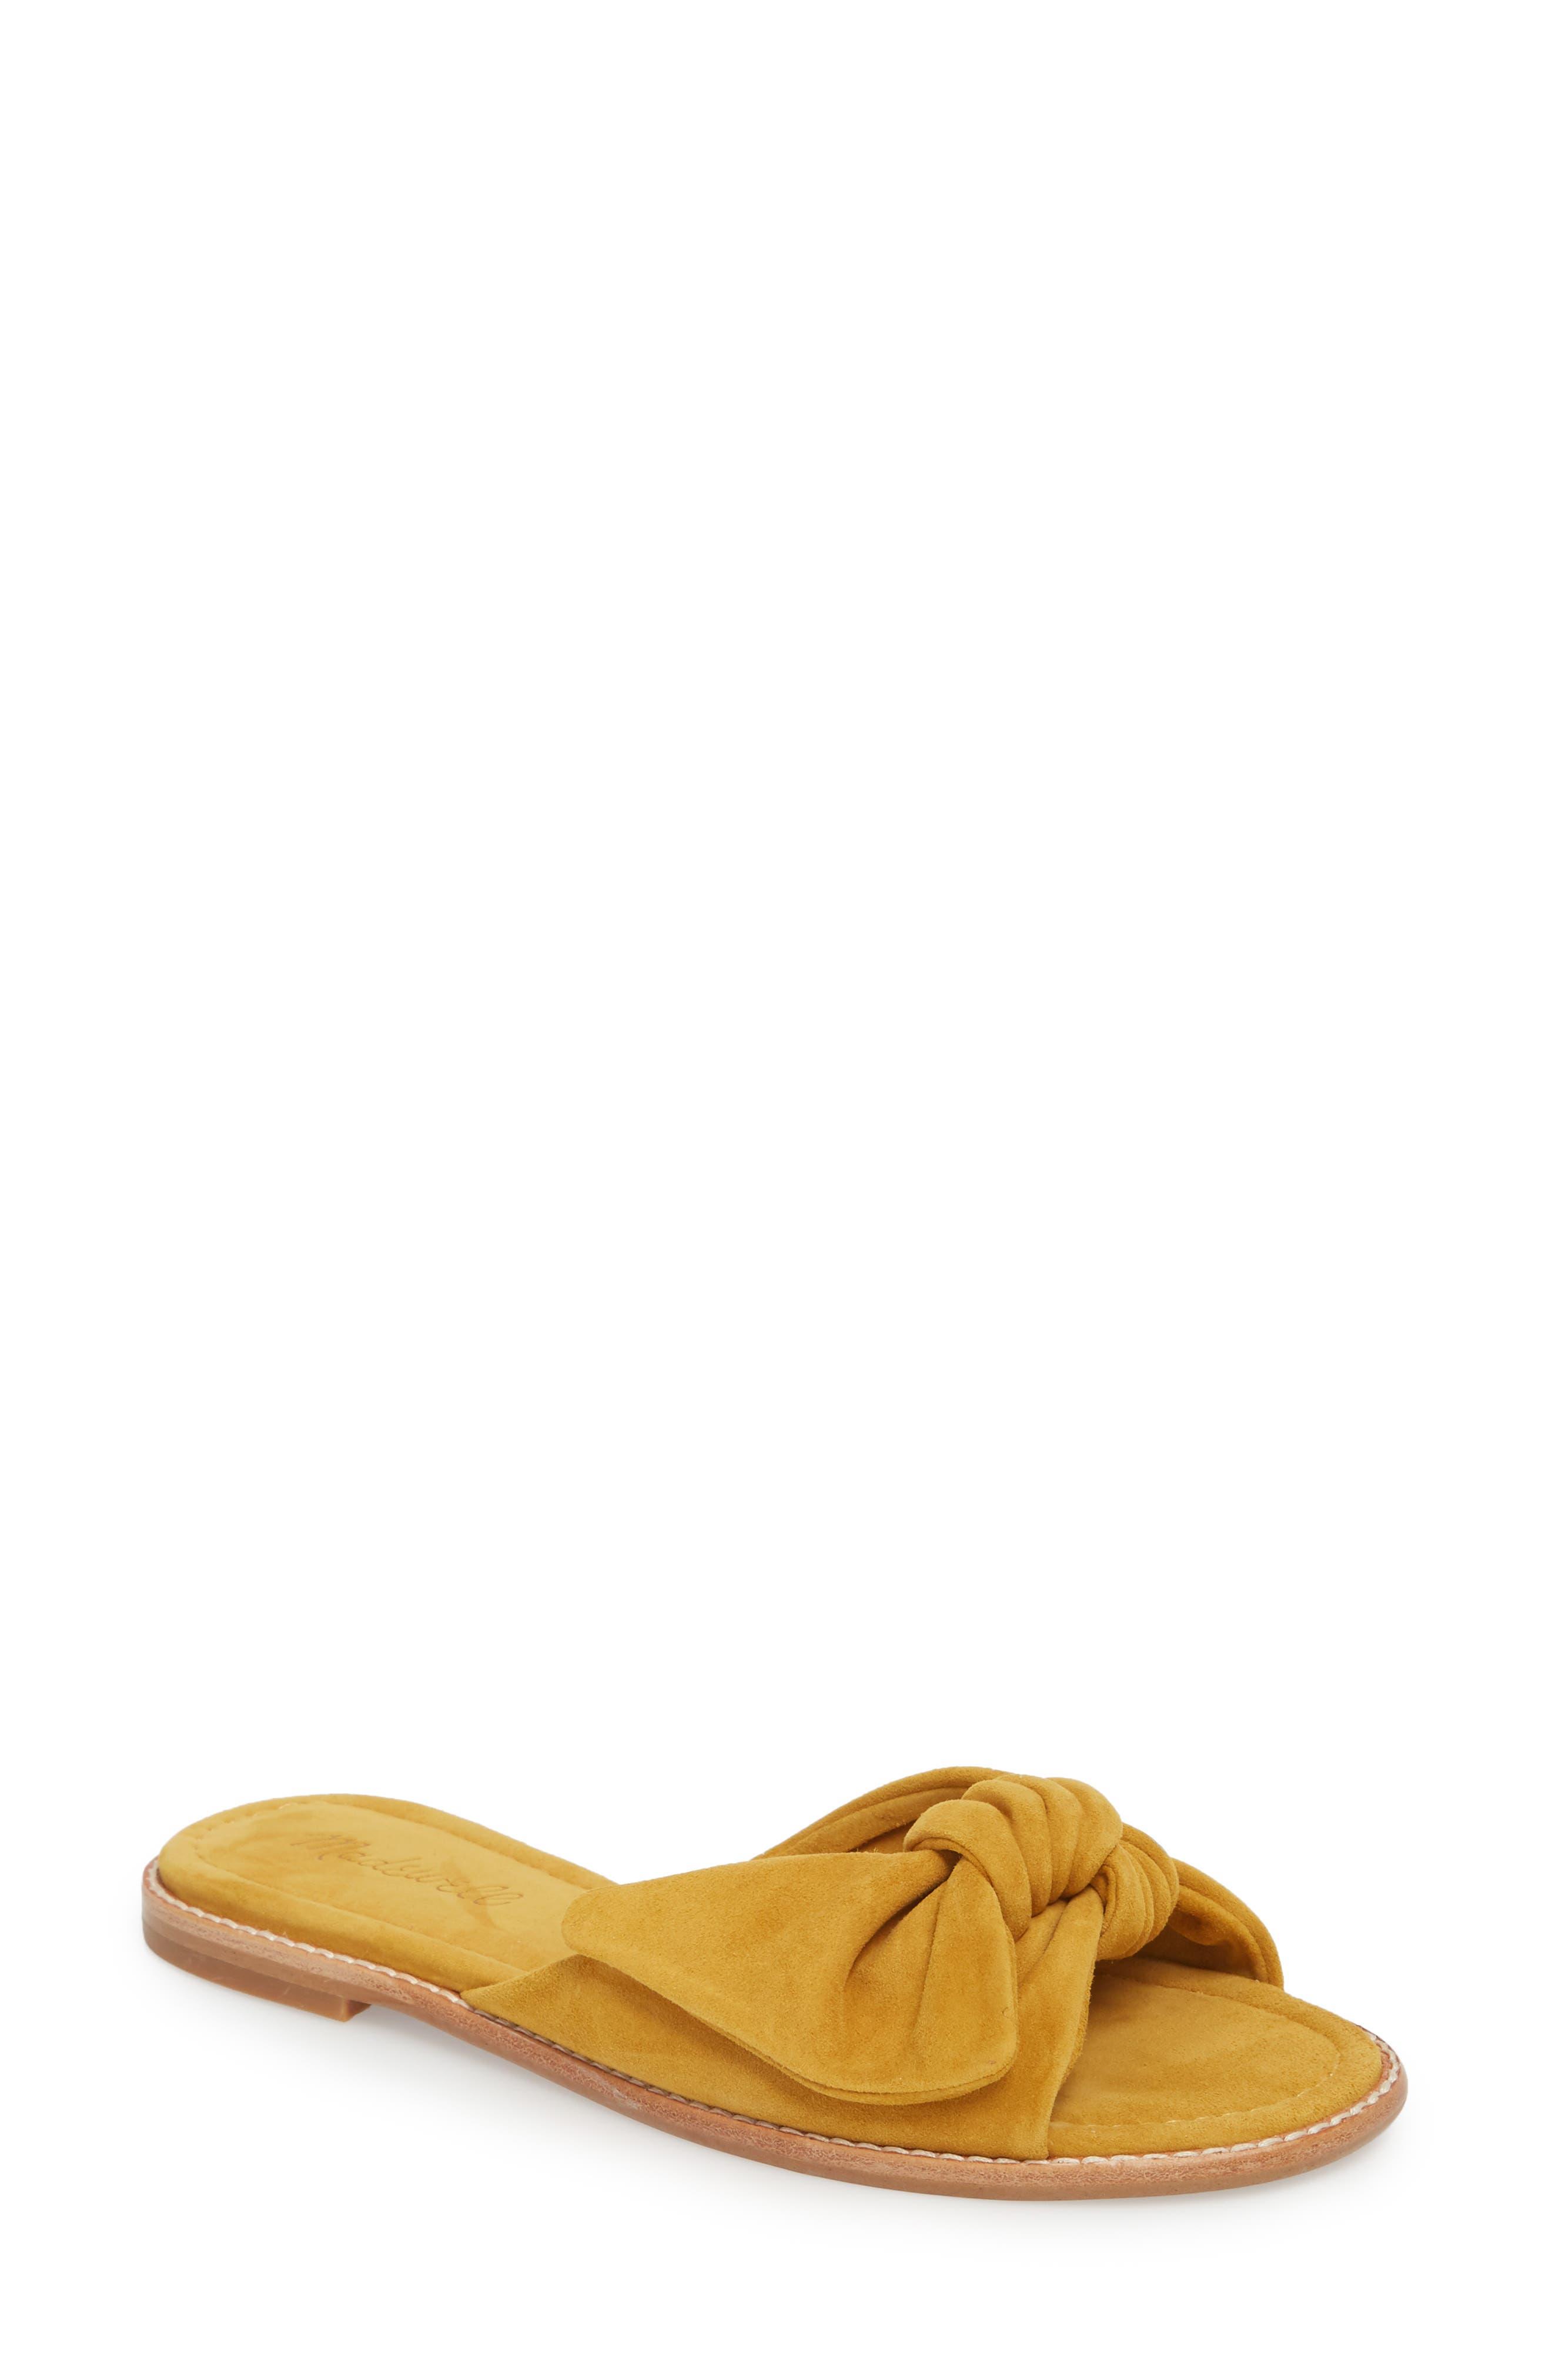 Naida Slide Sandal,                             Main thumbnail 1, color,                             Cider Leather